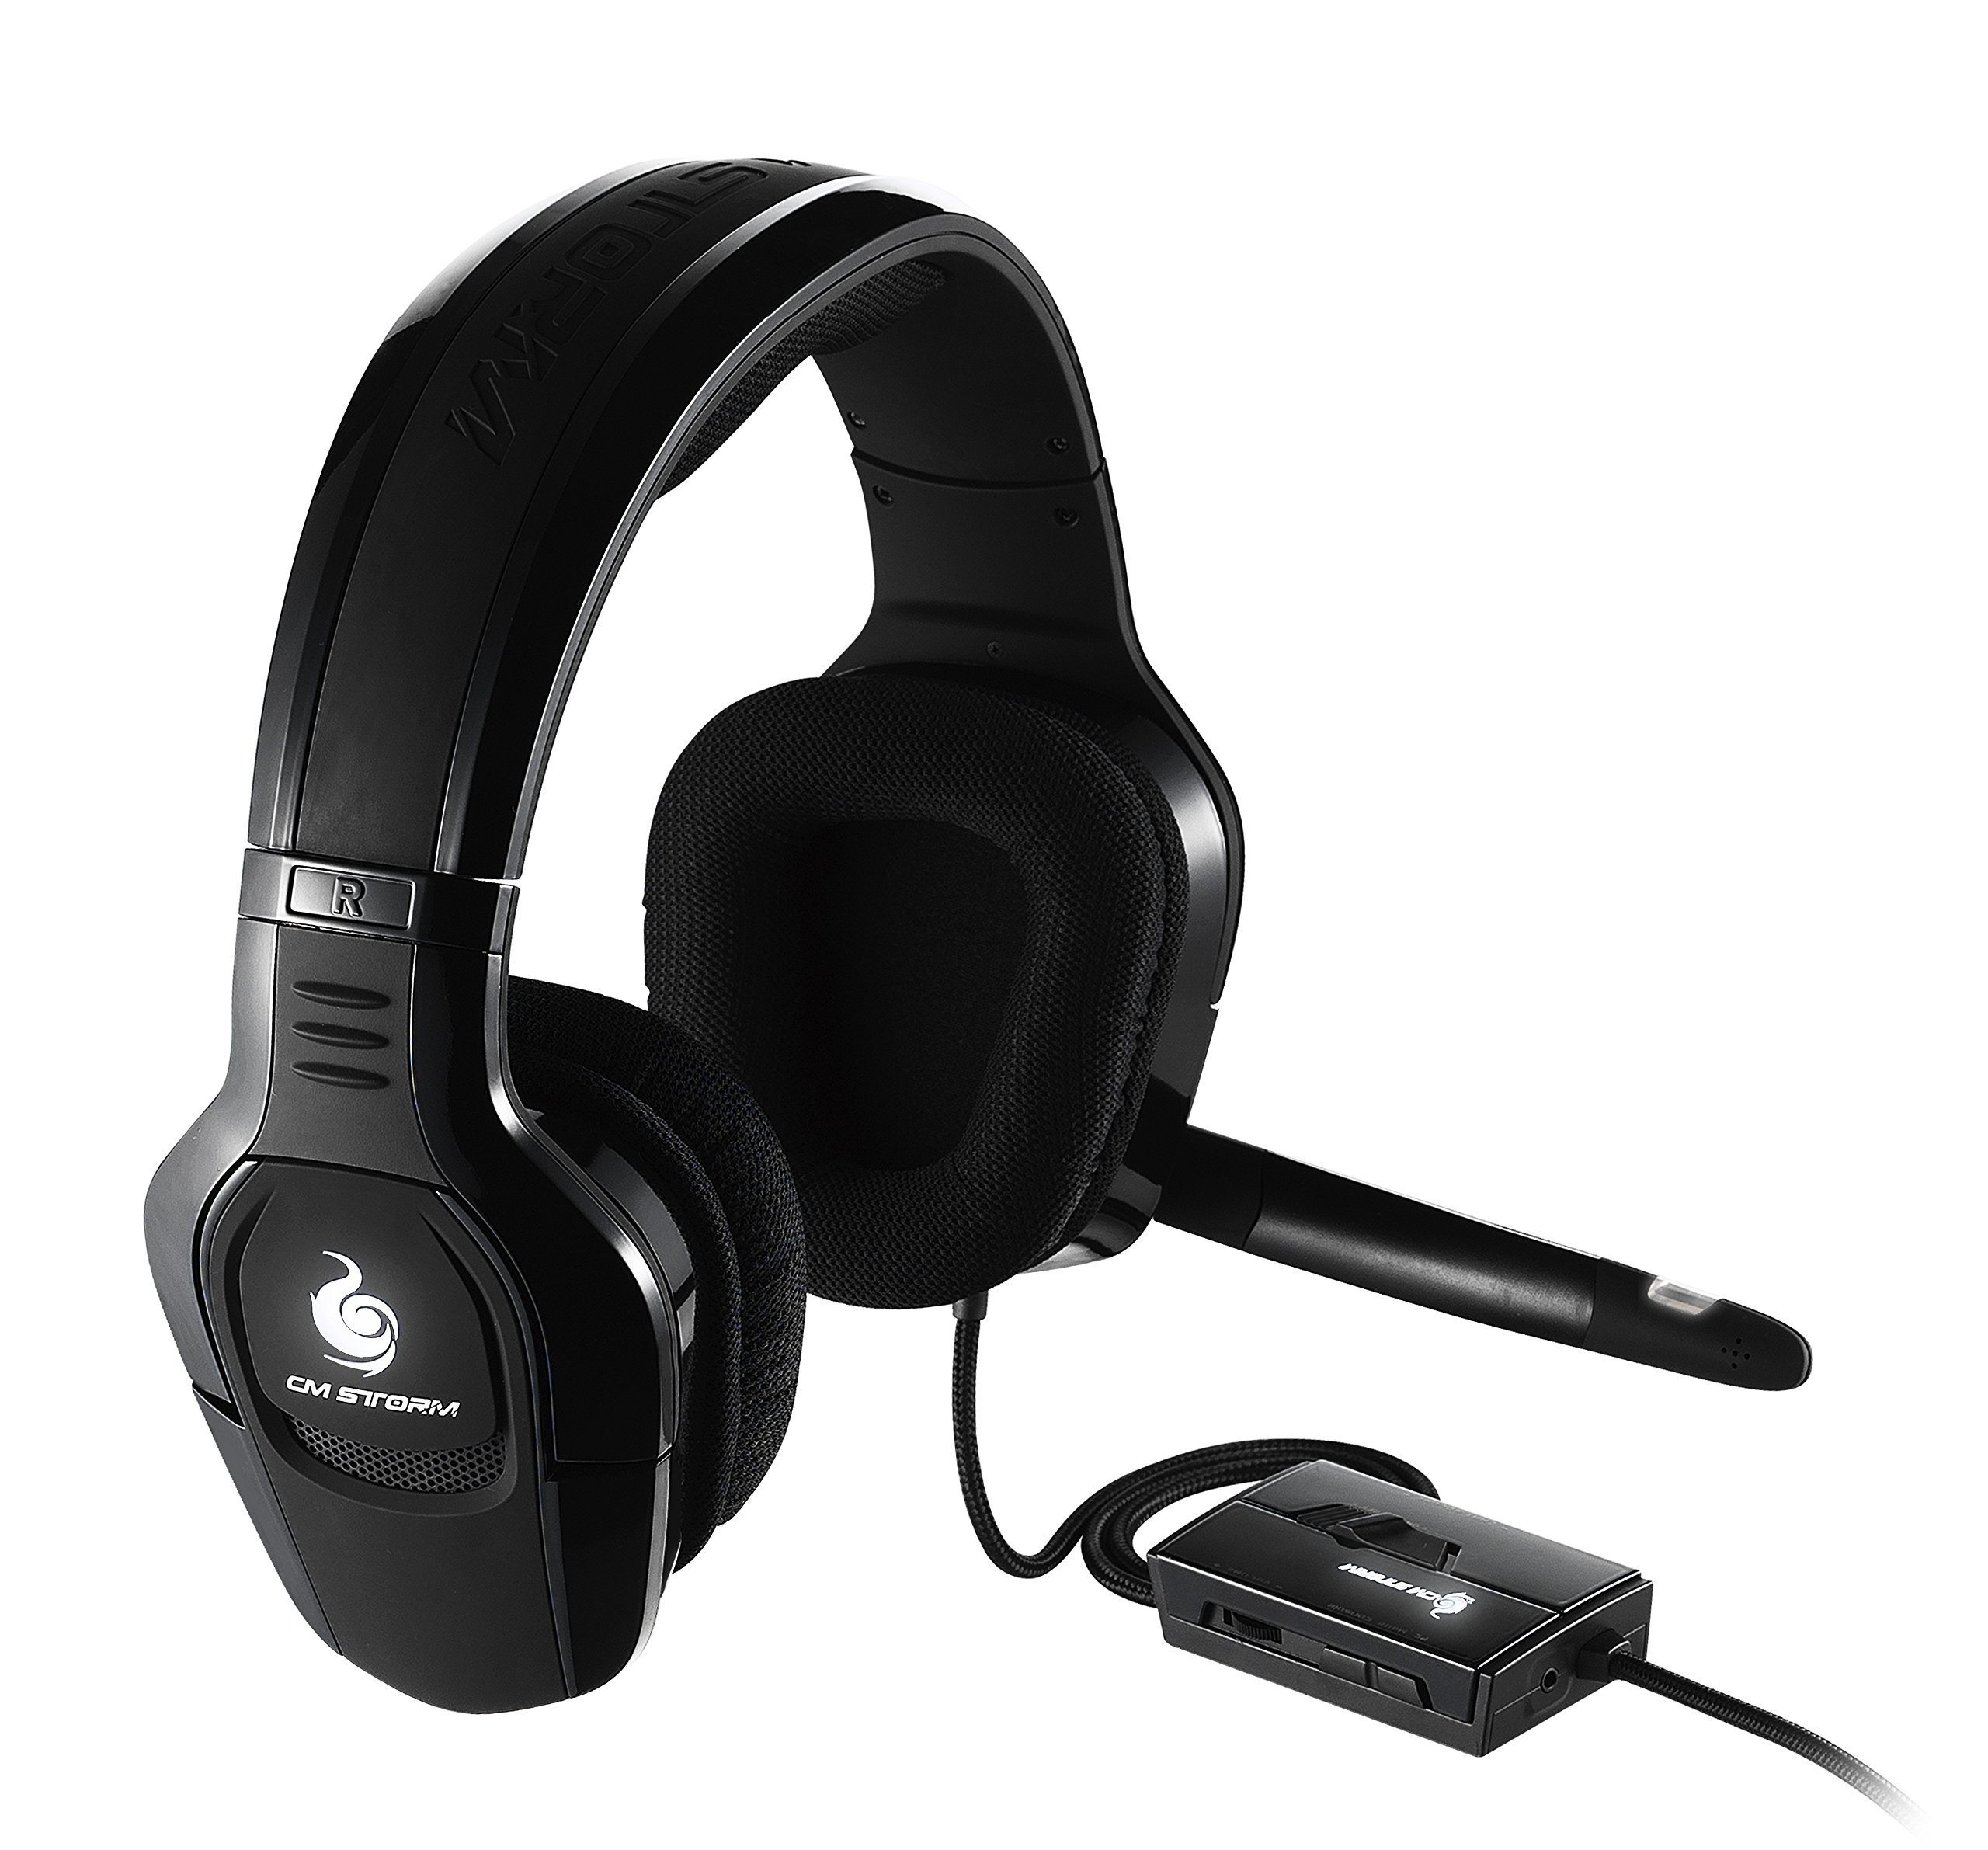 Cooler Master Sirus C Gaming Headset 'Weiße LED-Beleuchtung, Lautstärkeregler mit Stummschalter, 2.2 Channel, 44mm Treibern' SGH-4650-KC3D1 by Cooler Master (Image #1)